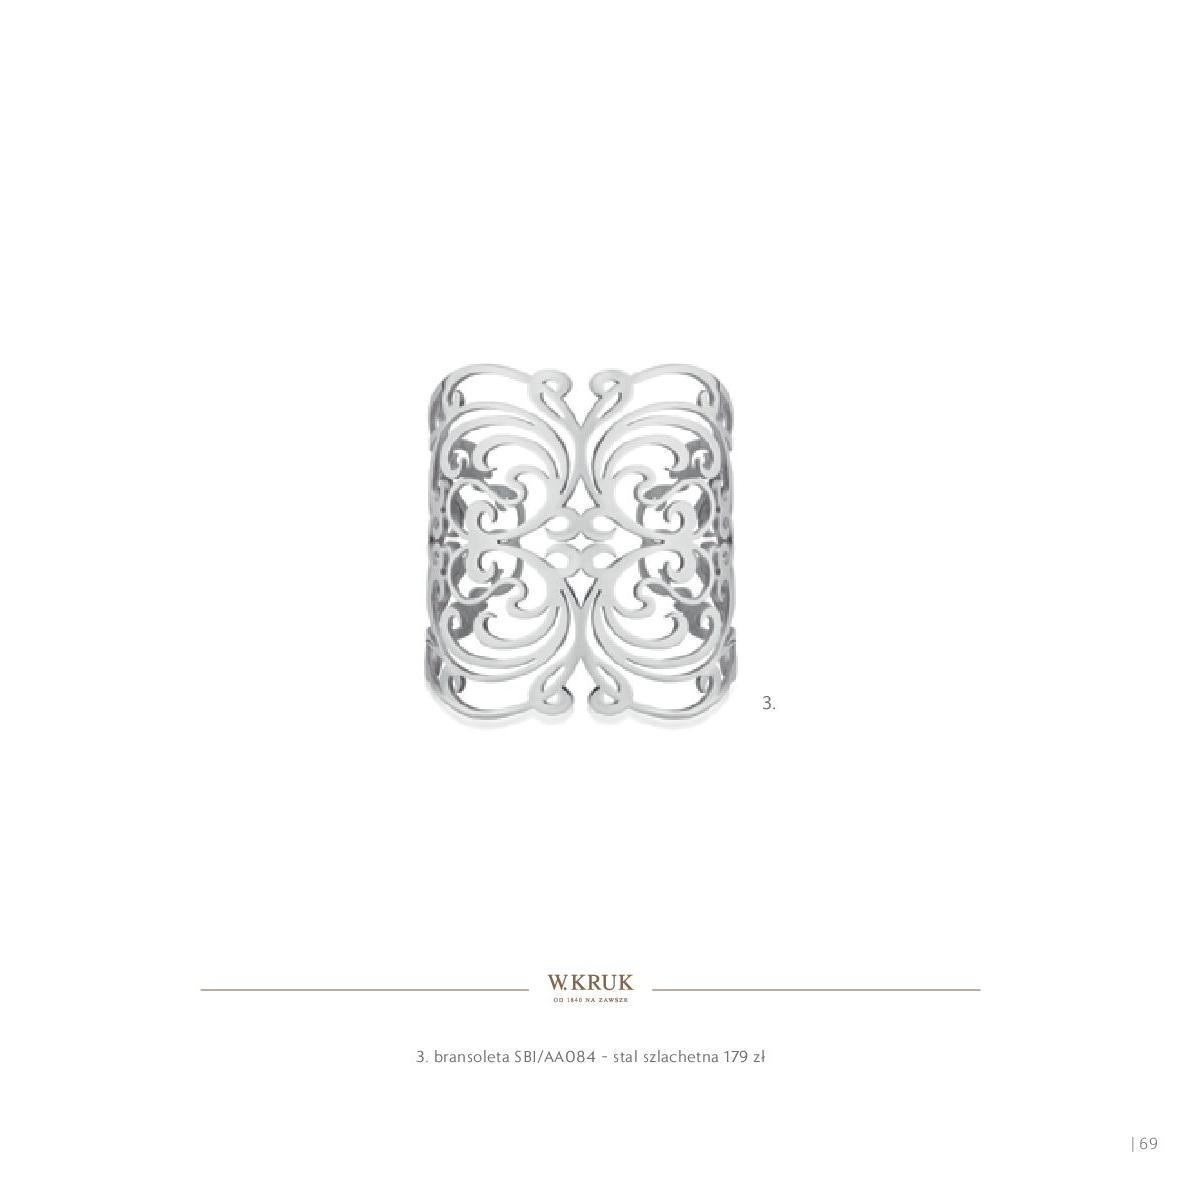 Gazetka W. KRUK: Katalog - Akcesoria 2021-02-17 page-71